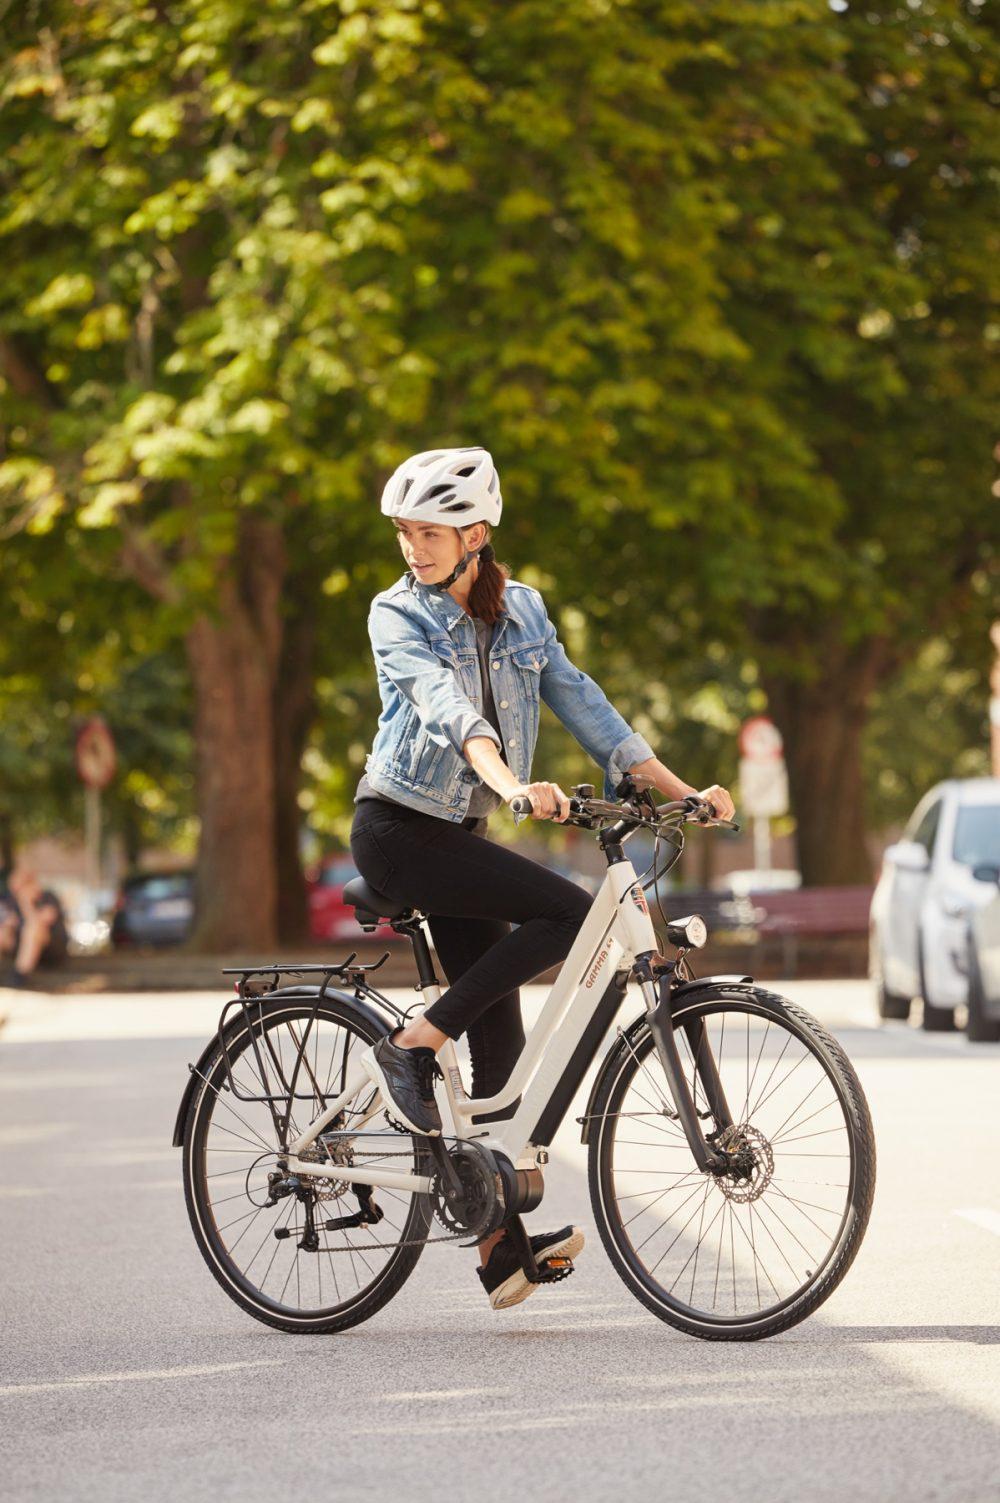 Step-Through style with Hidden Battery | High Torque Centre Motor | Stylish City Bike